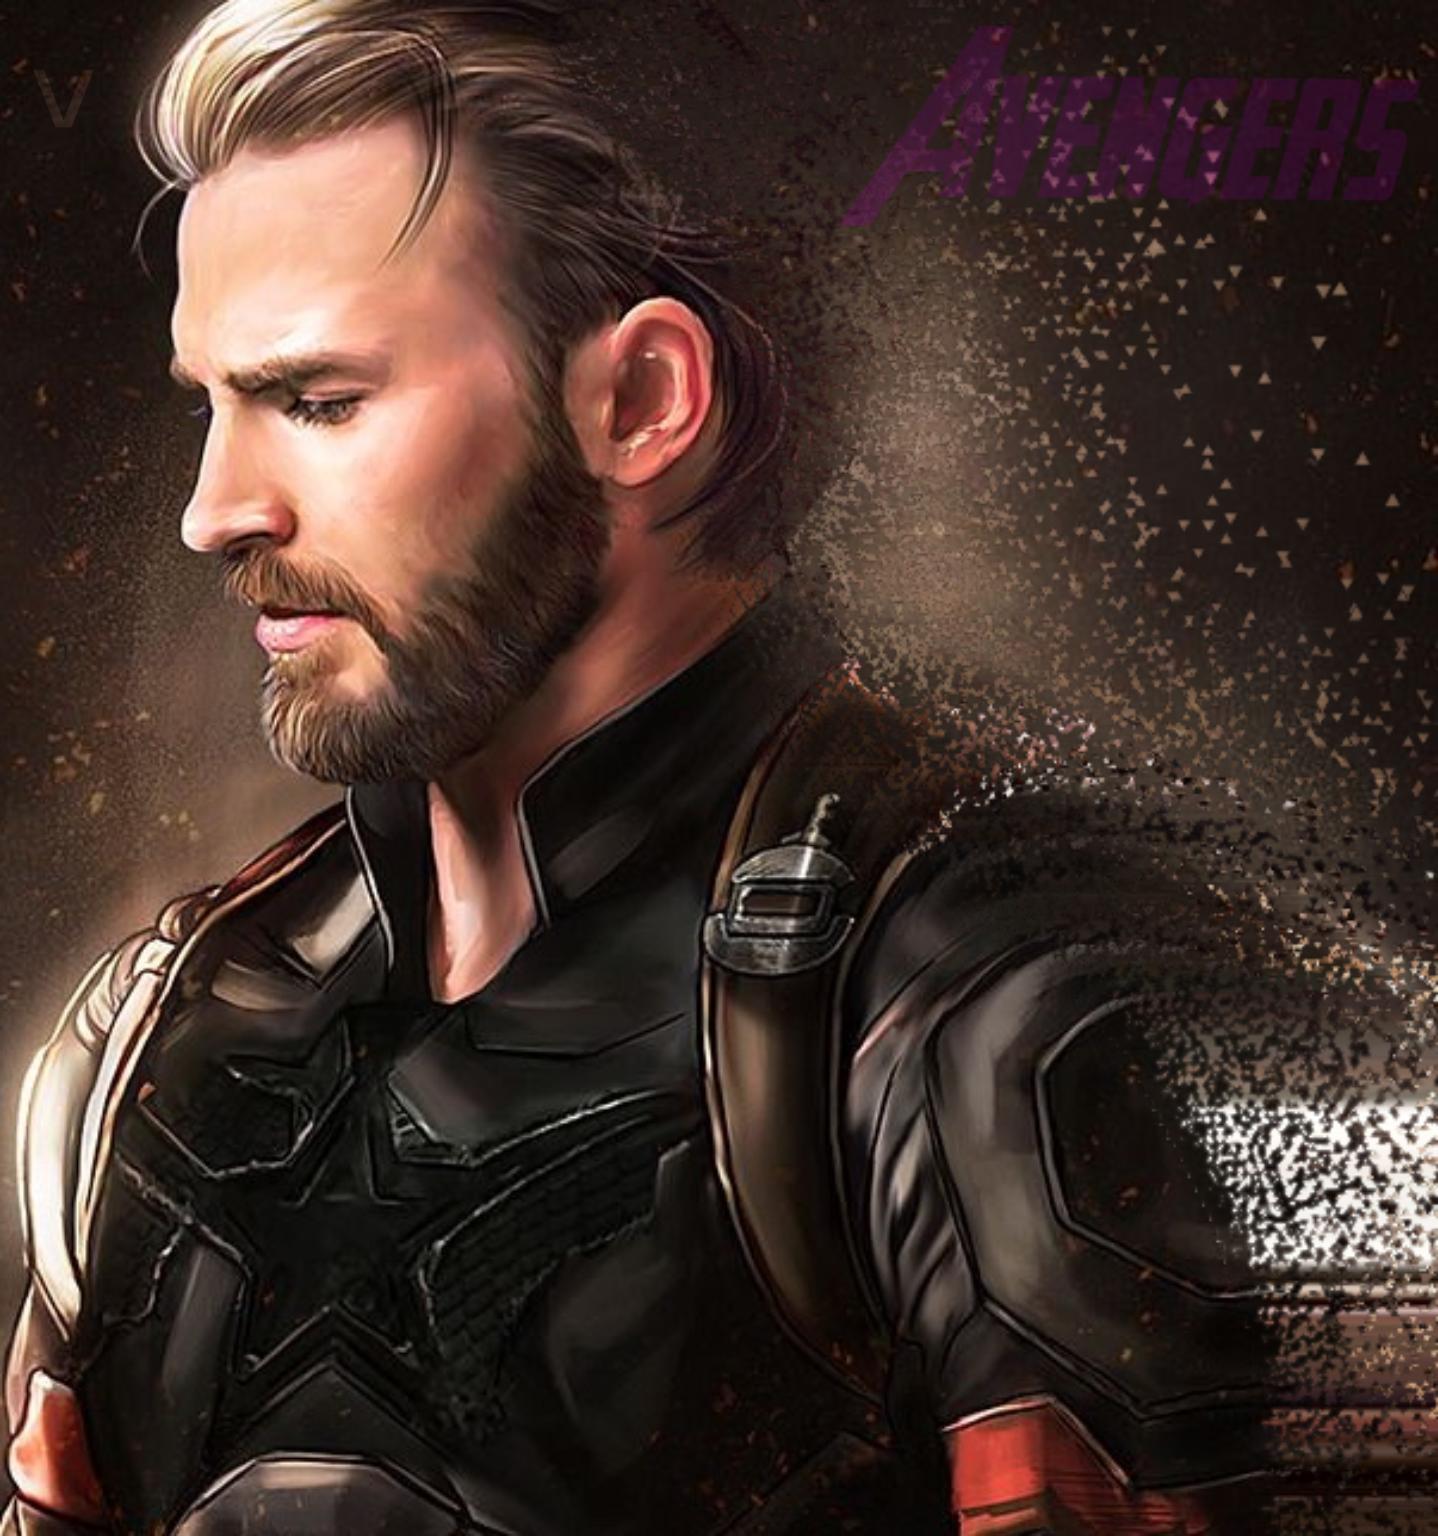 Fondos De Pantalla Steve Rogers Capitan America Avengers